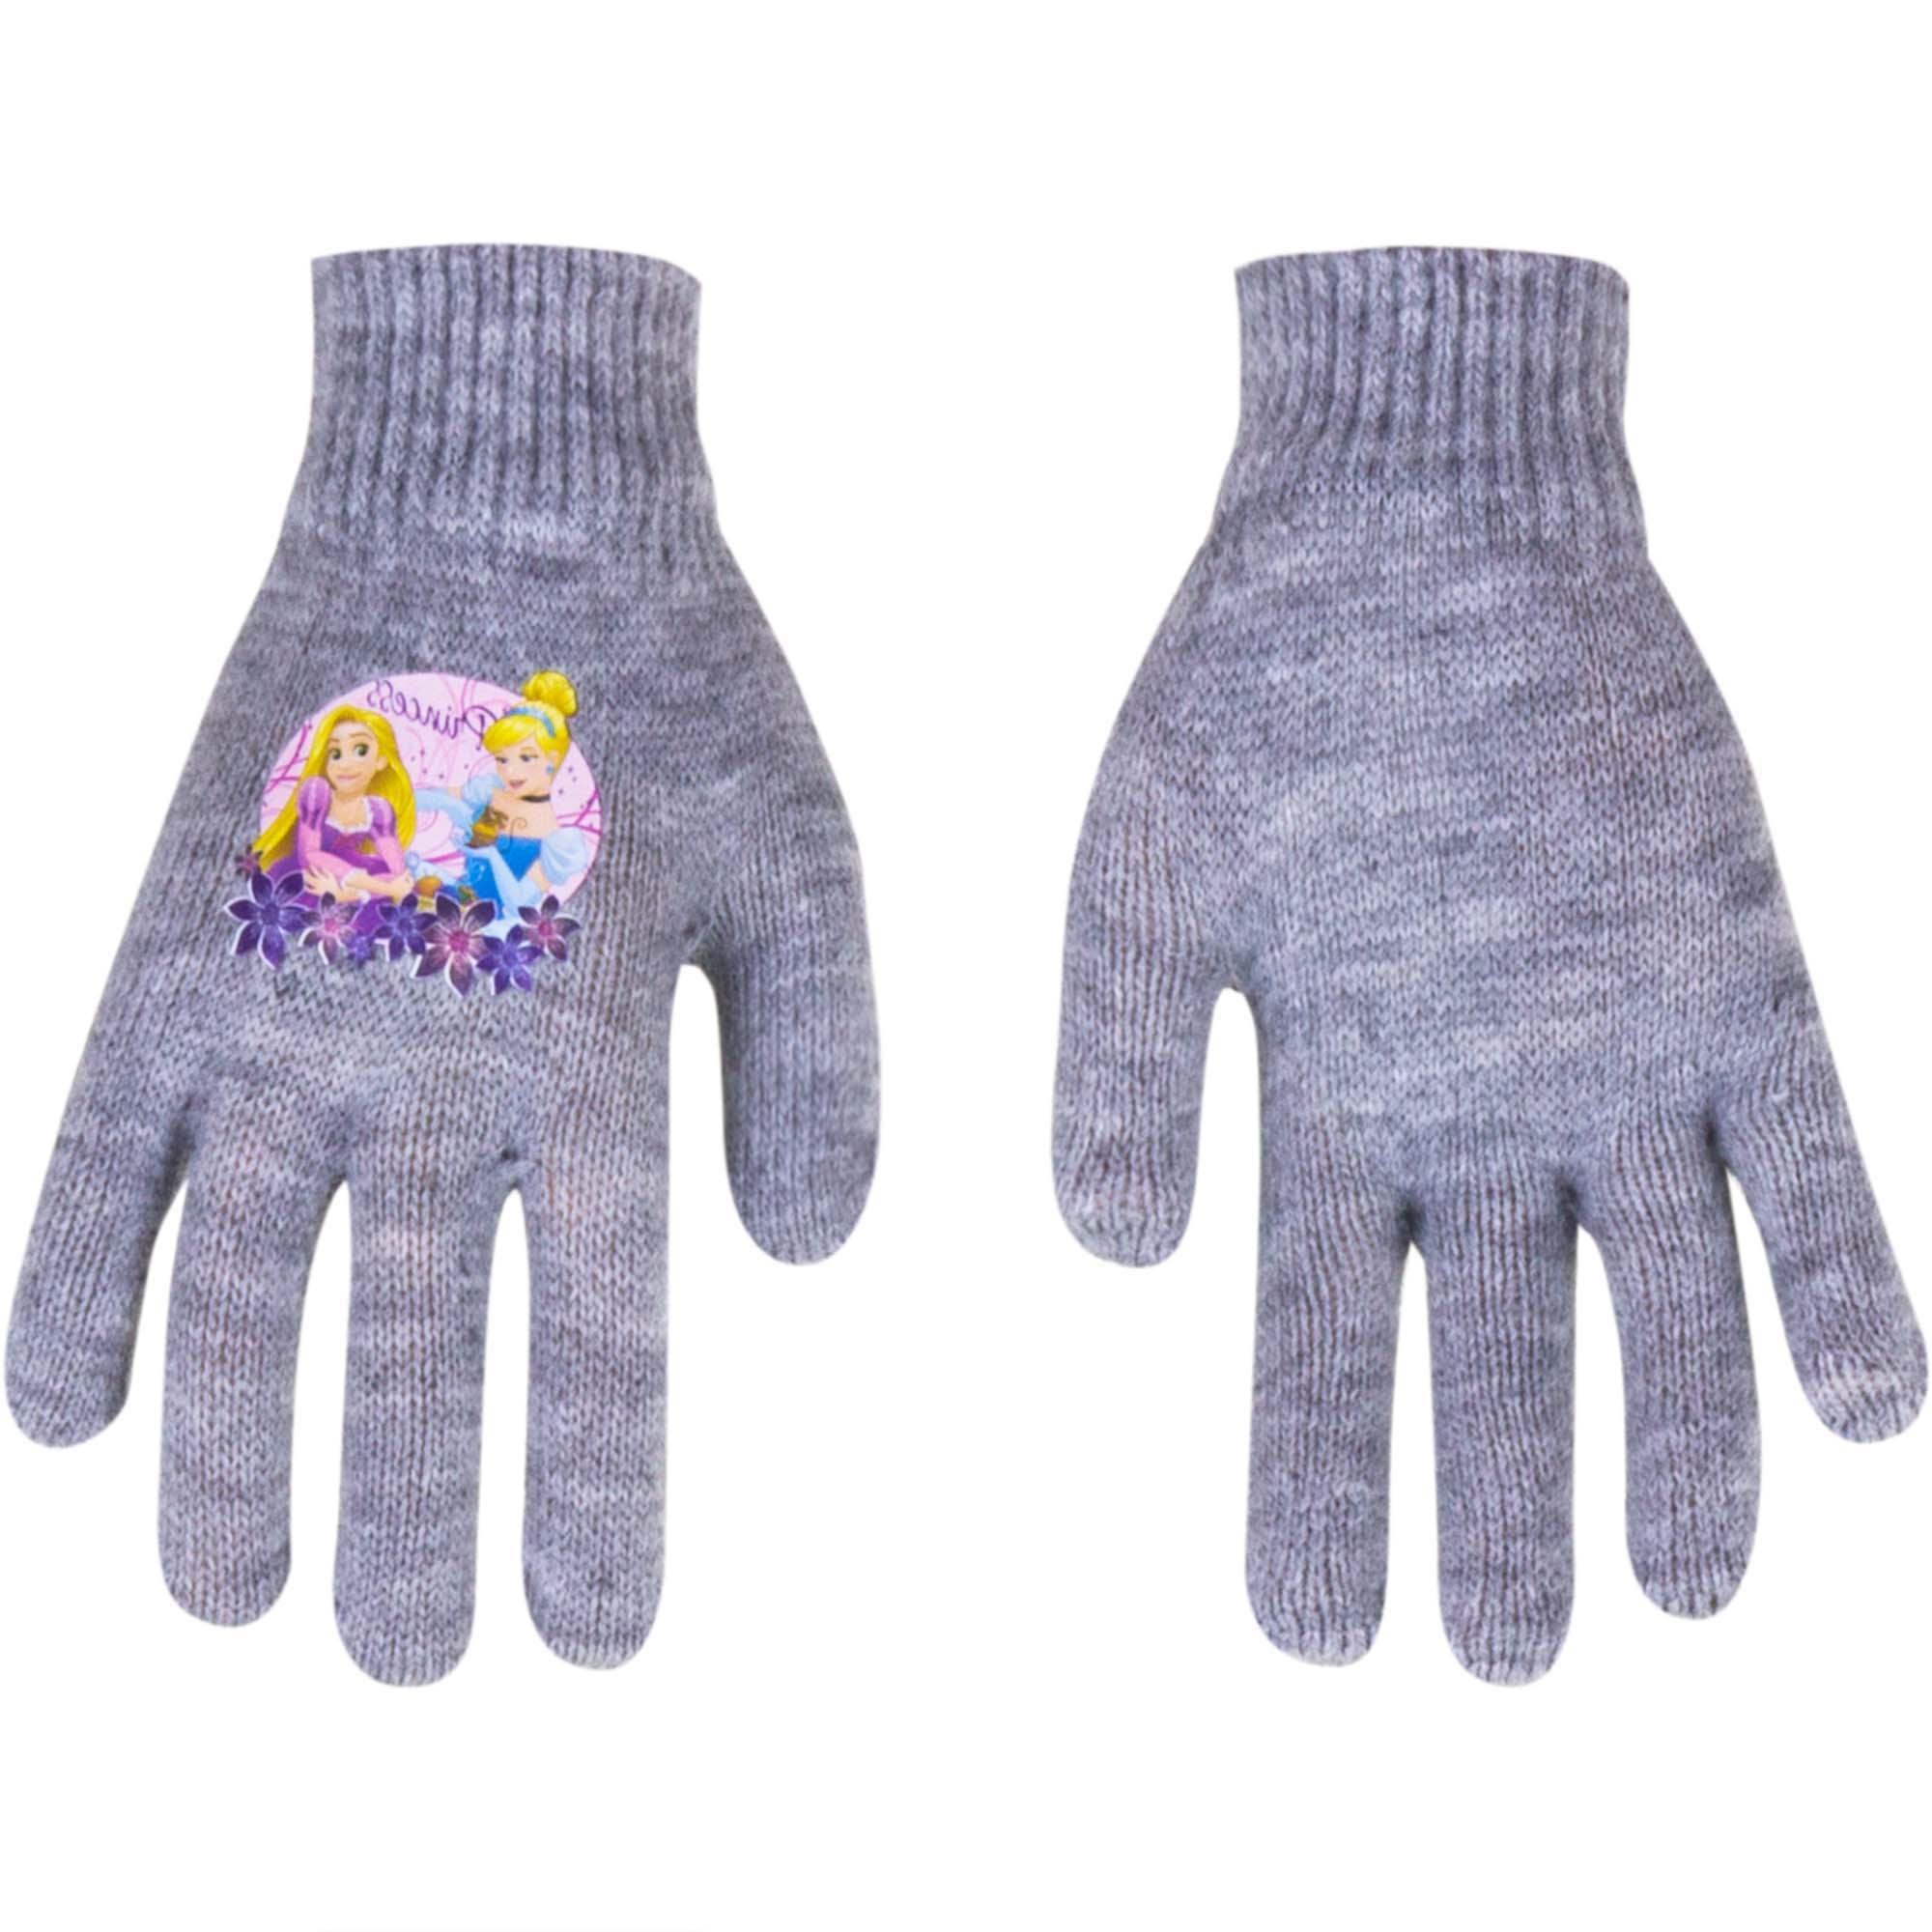 Princess gloves Magic Grey (Age: 2-5 years old)